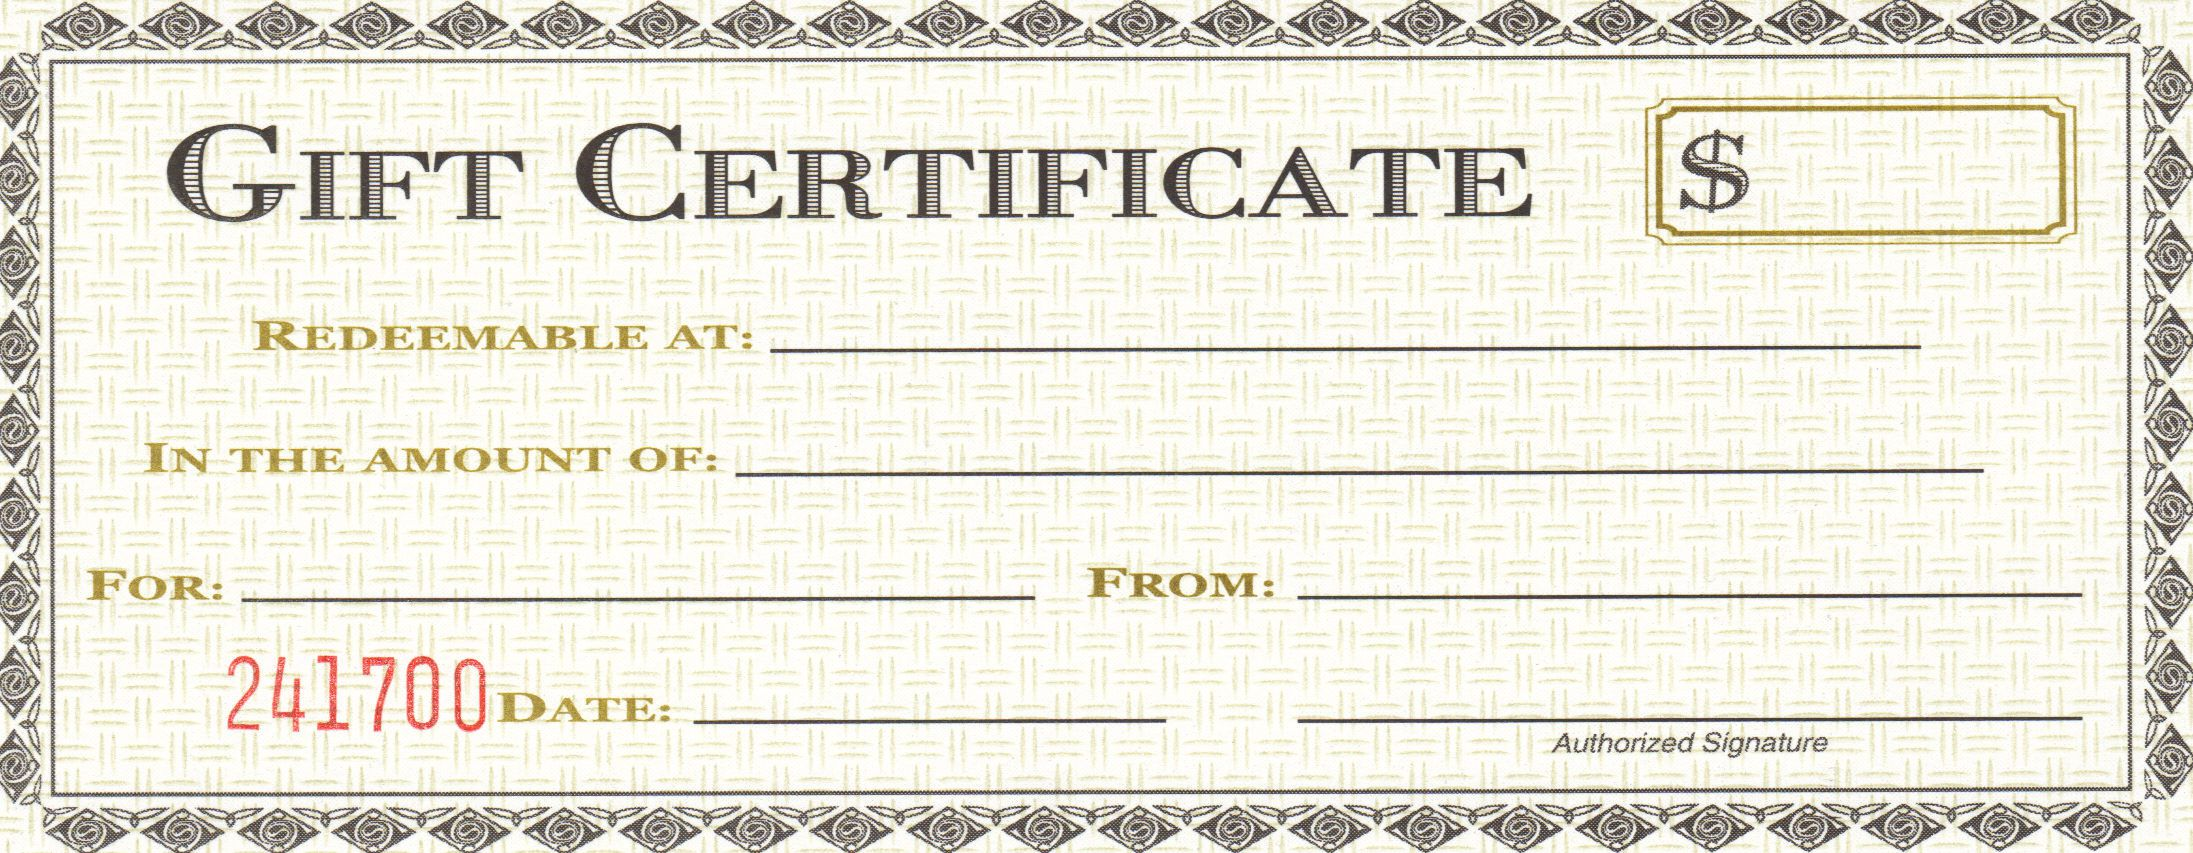 007 Sensational Gift Certificate Template Pdf Design  Massage Christma PrintableFull